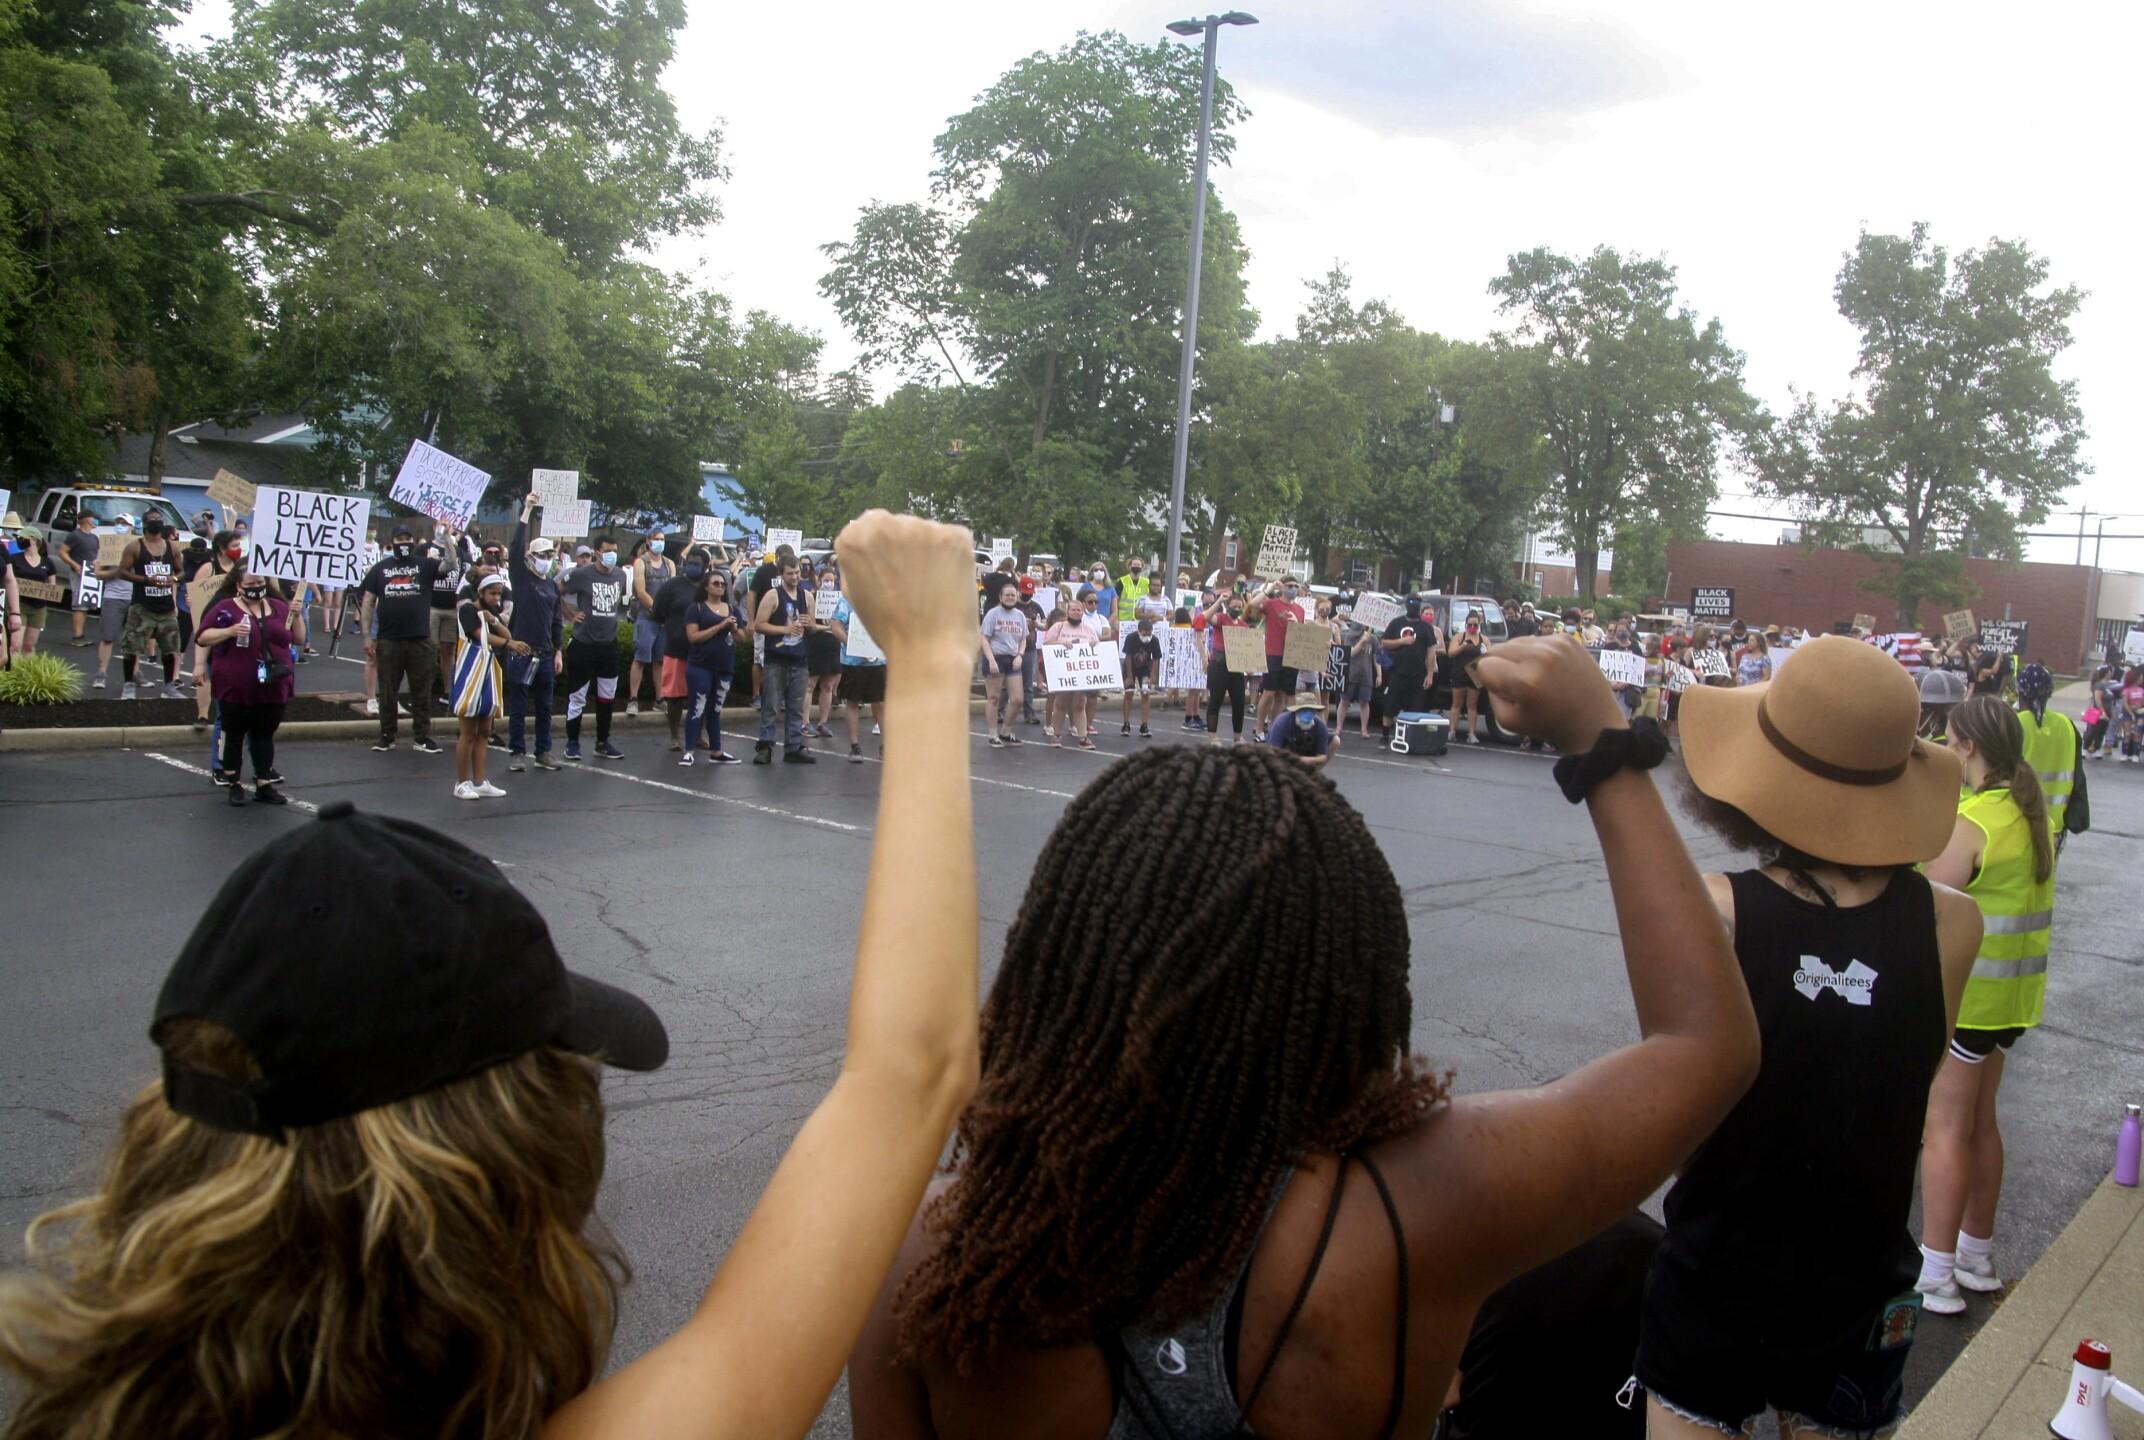 062020_milfordprotest26.jpg